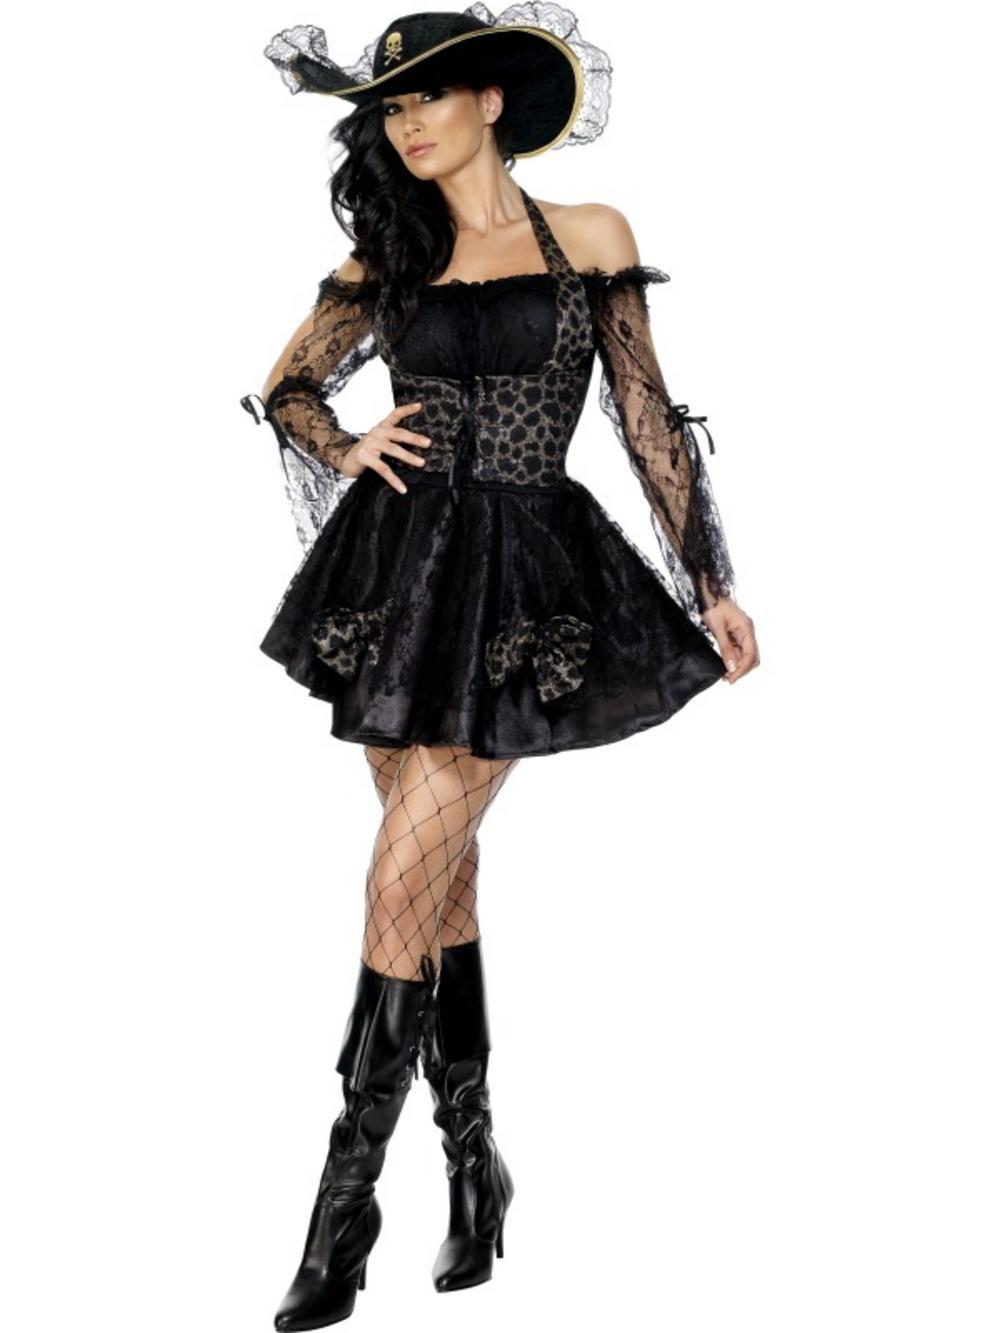 Sexy Swashbuckler Pirate Costume